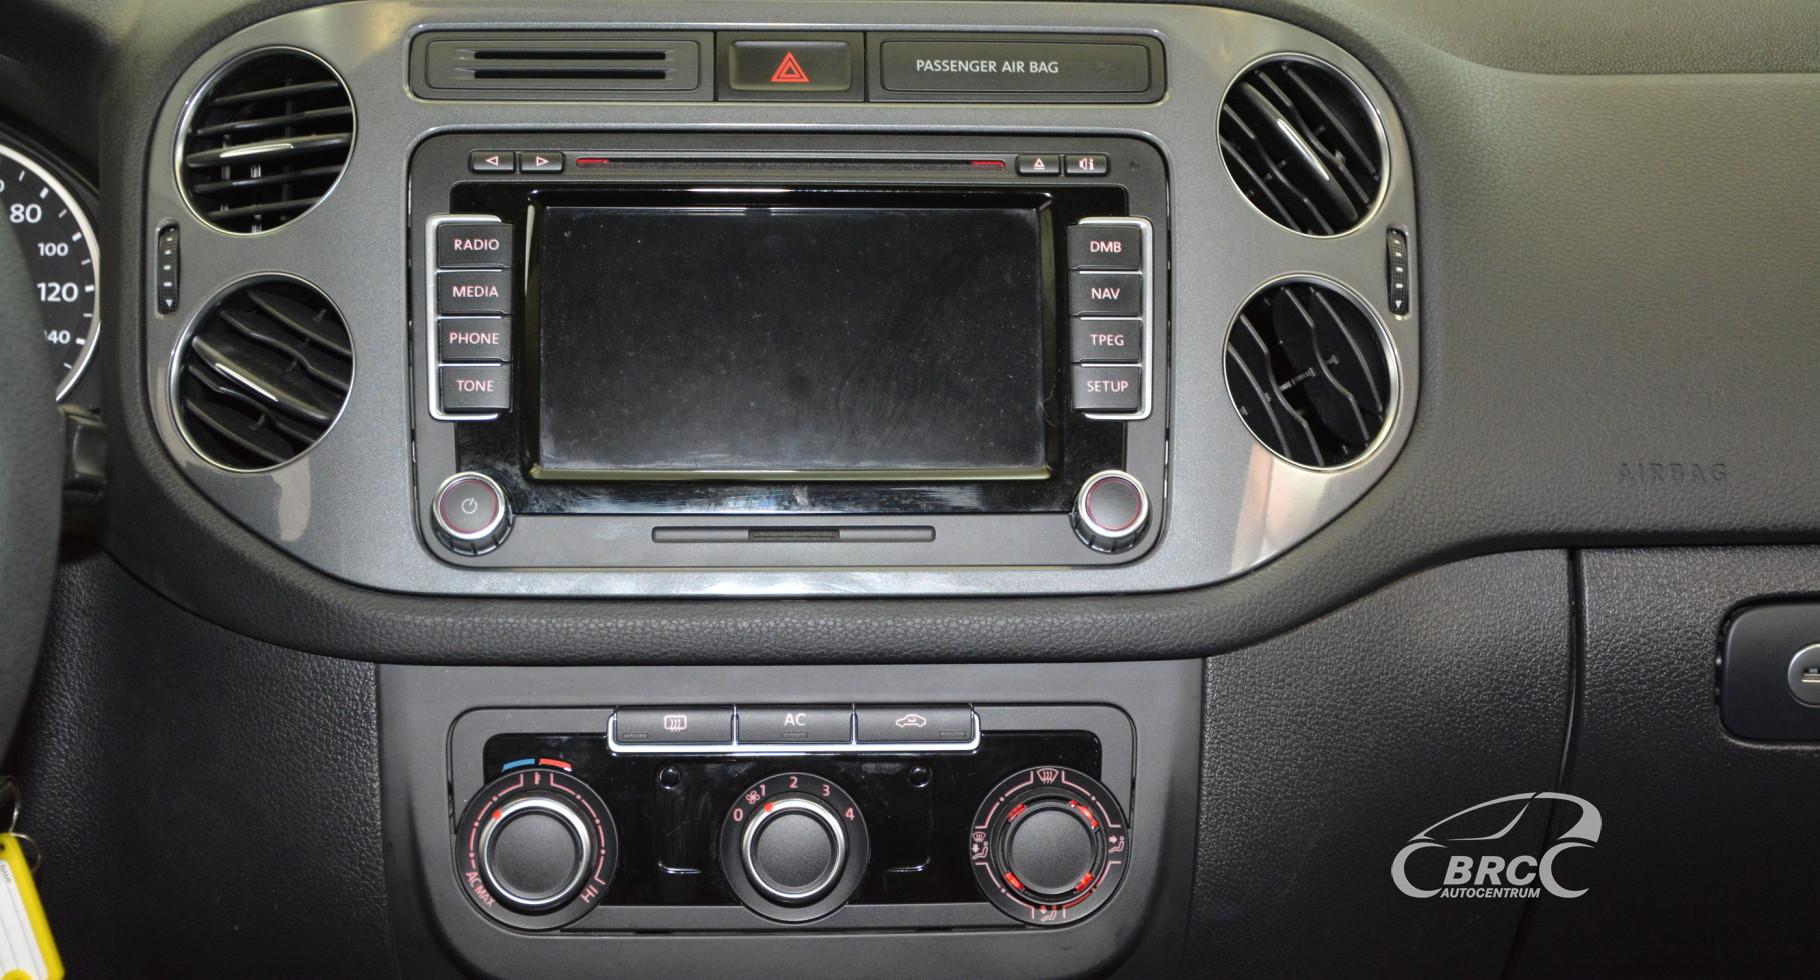 Volkswagen Tiguan 2.0 TSI Automatas